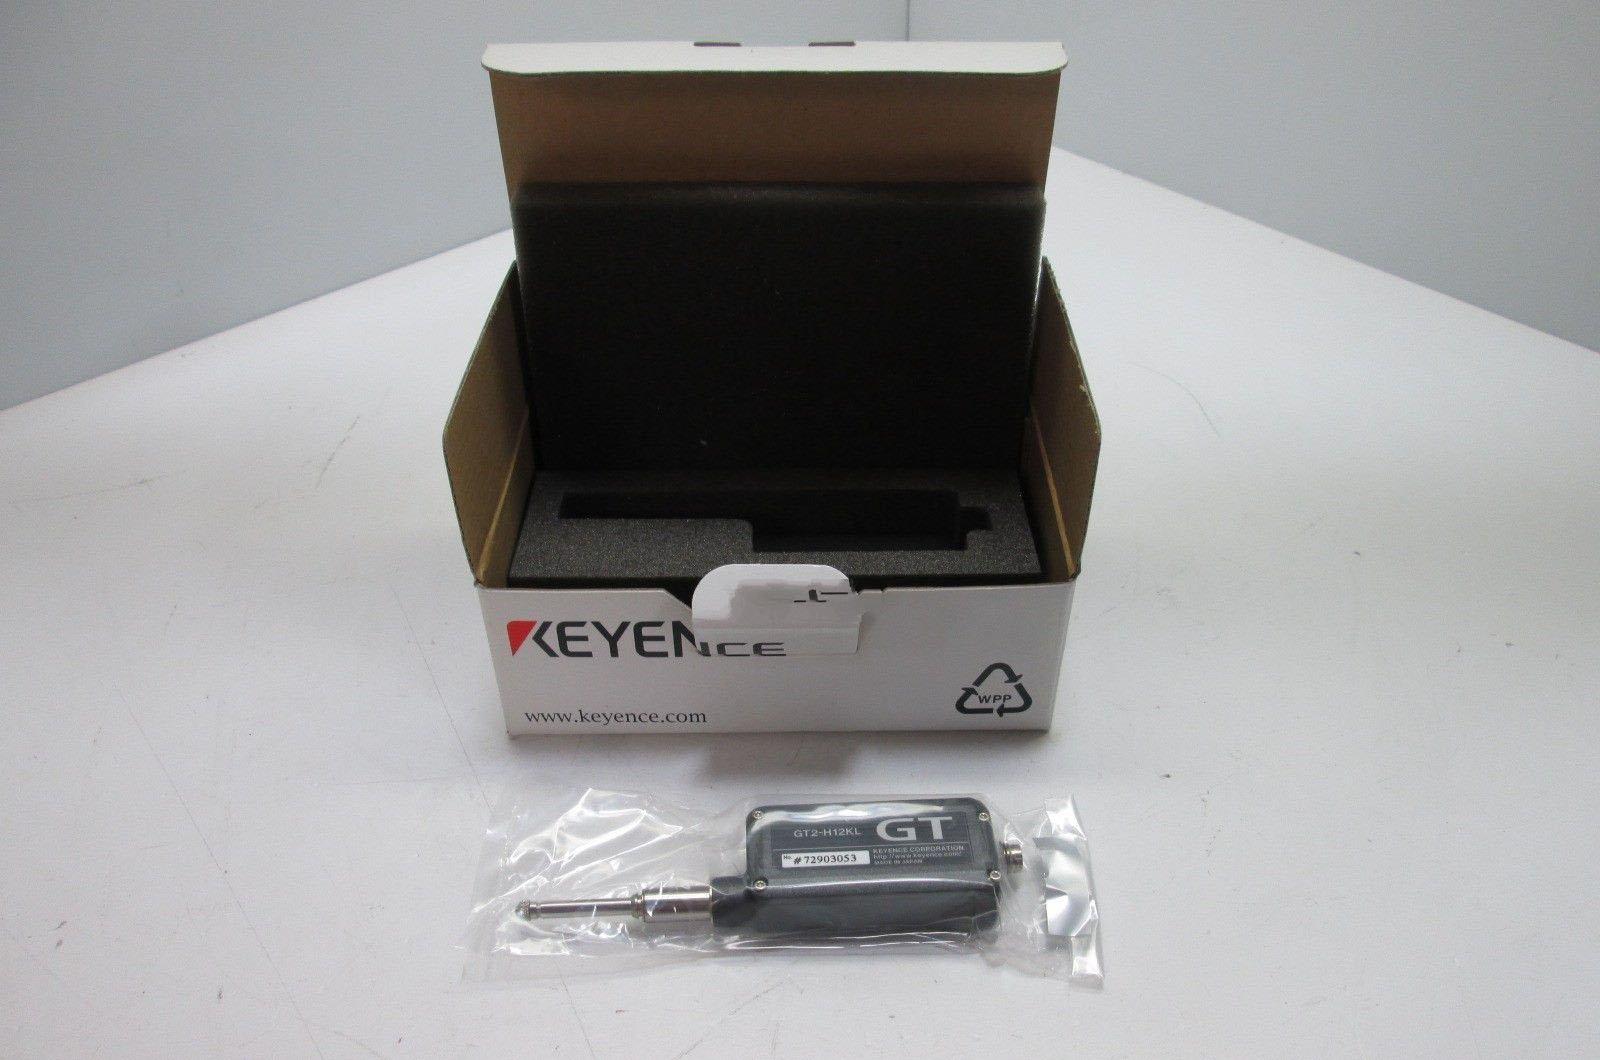 Keyence GT2-H12KL High Precision Force Sensor Head, 0.1µm Resolution, 12mm R